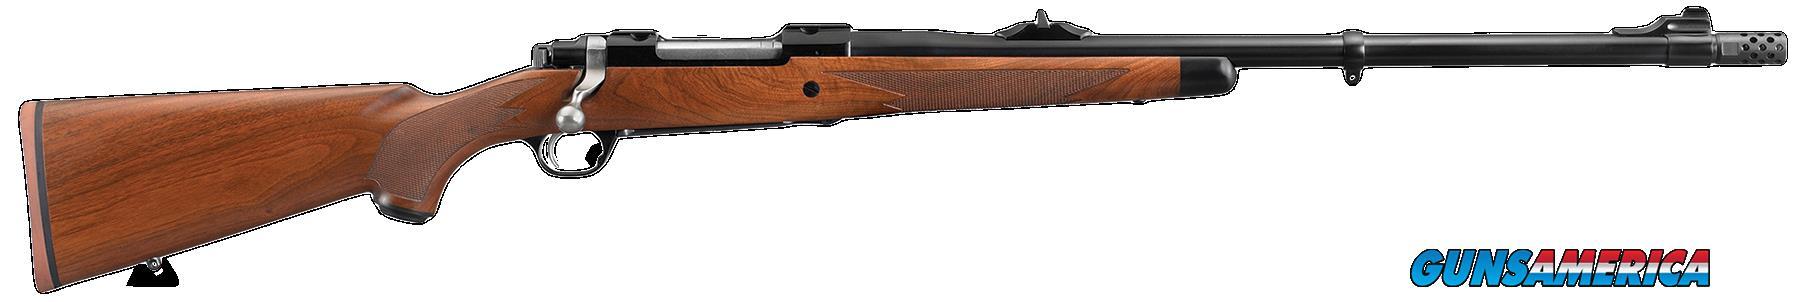 Ruger Hawkeye, Rug 47119 Hawkeye African  300 Mg  Mzbrk     Bl  Guns > Pistols > 1911 Pistol Copies (non-Colt)